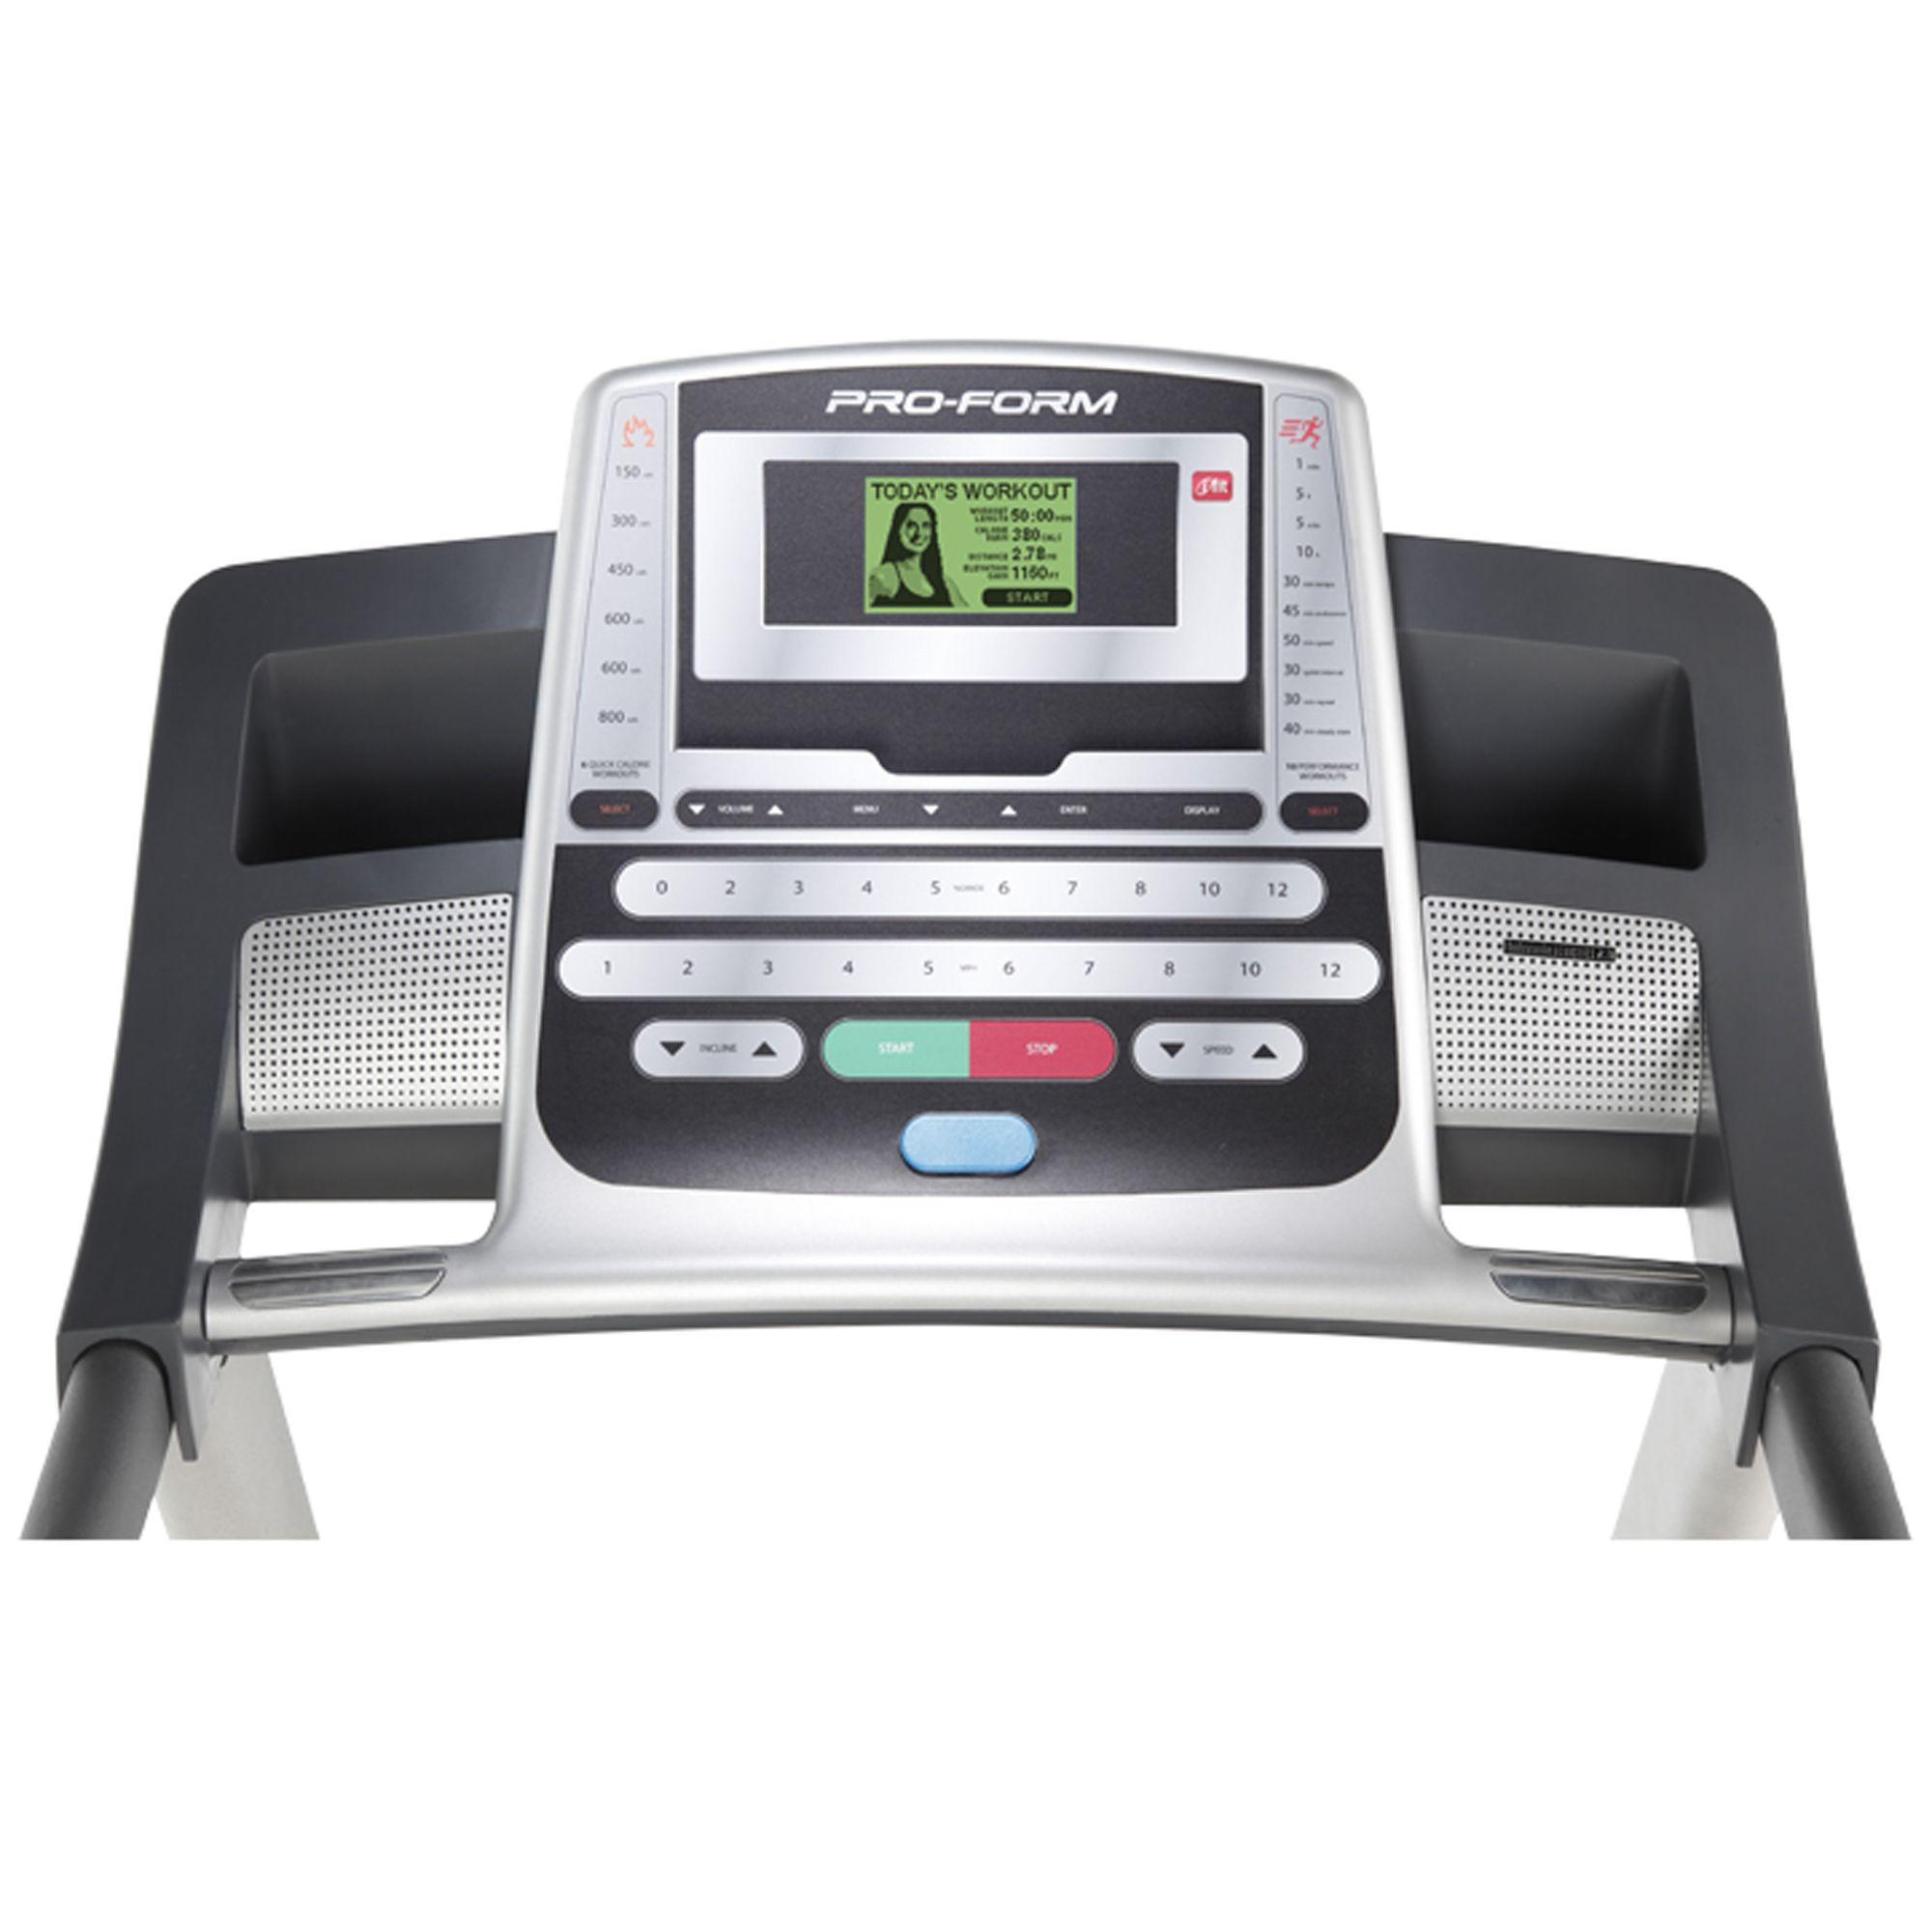 ProForm XP 690T Treadmill